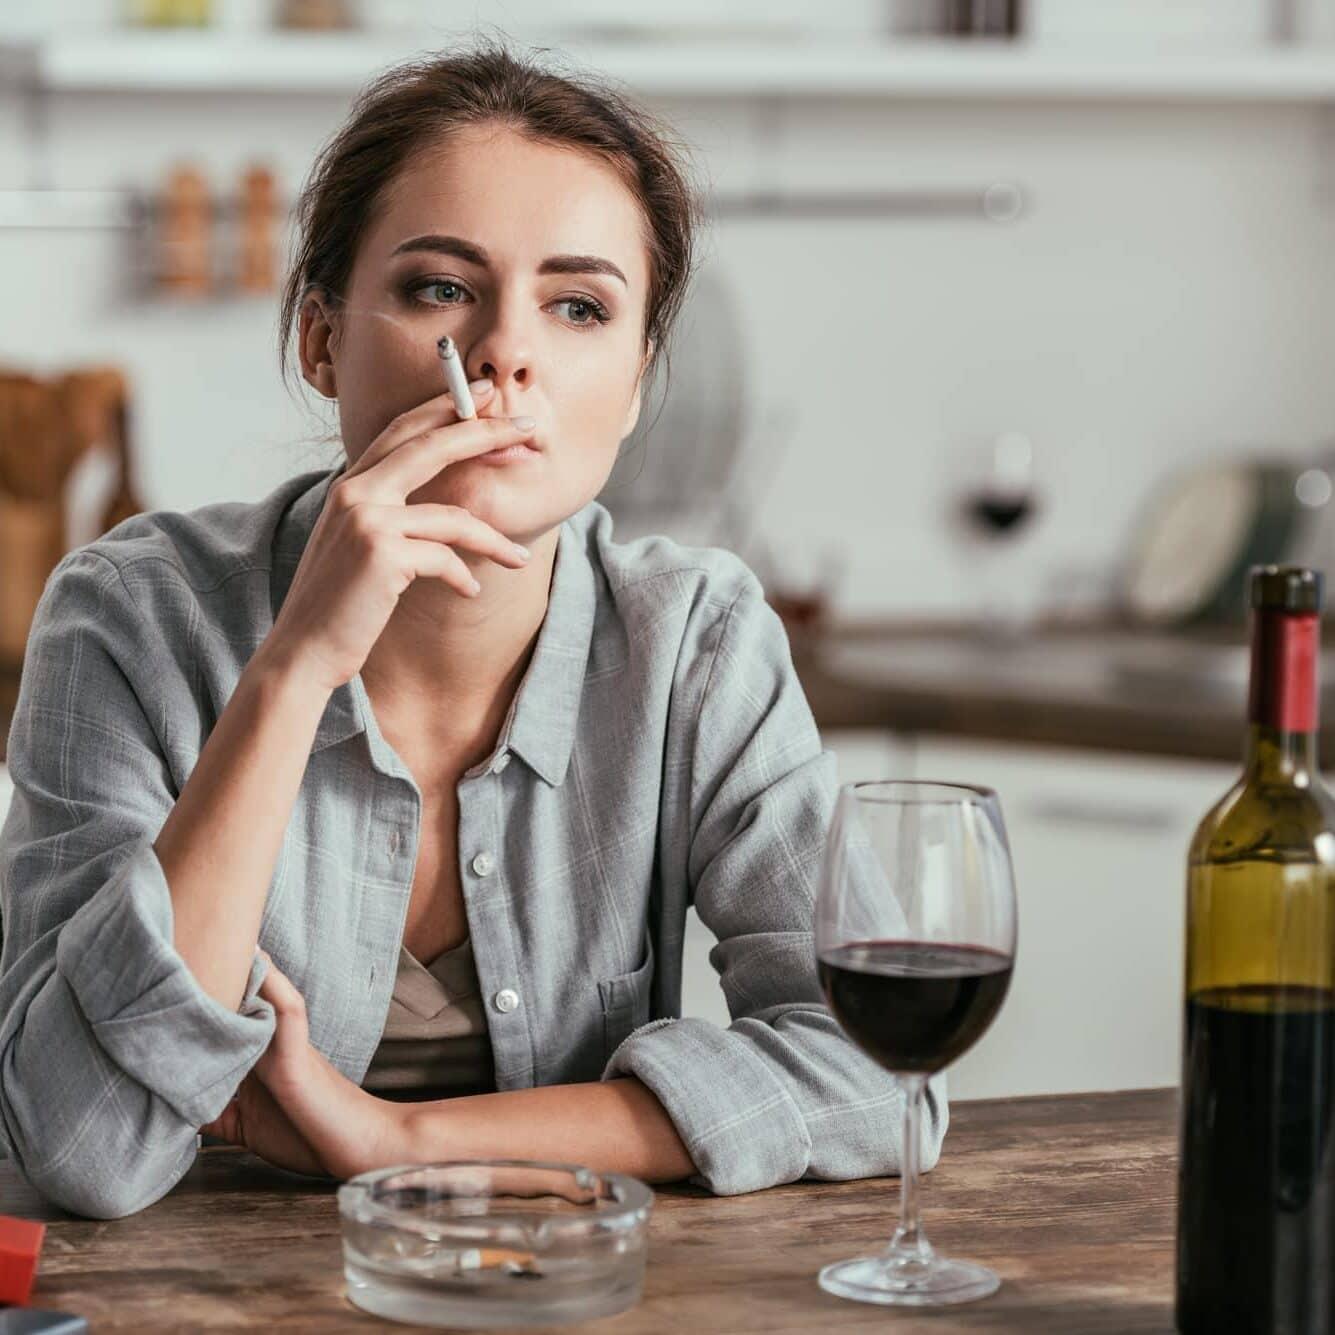 woman smoking and drinking wine